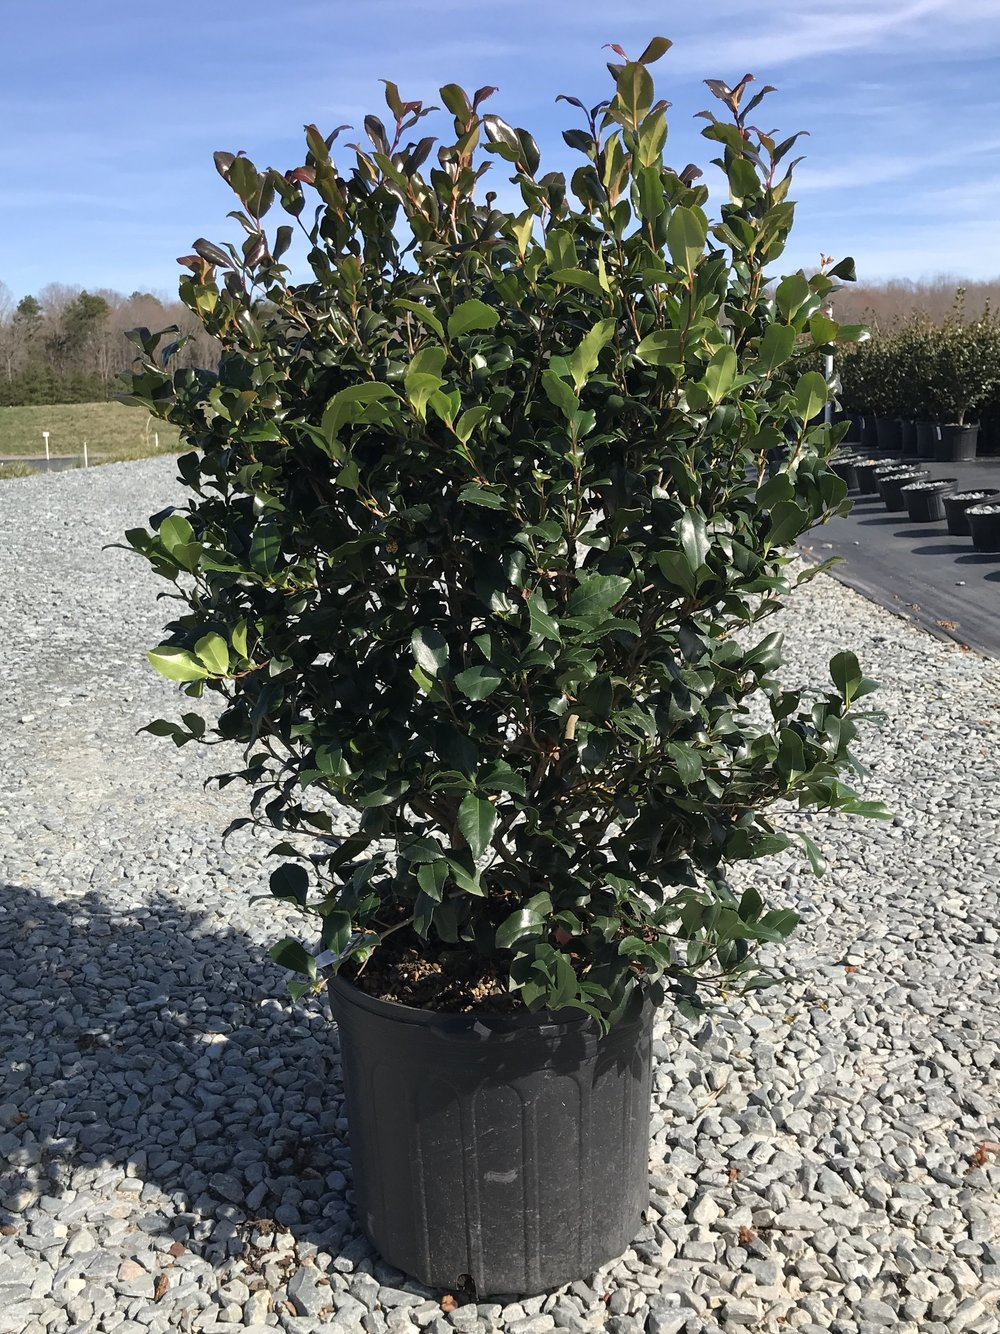 Camellia sasanqua 'Cleopatra', 7 gallon